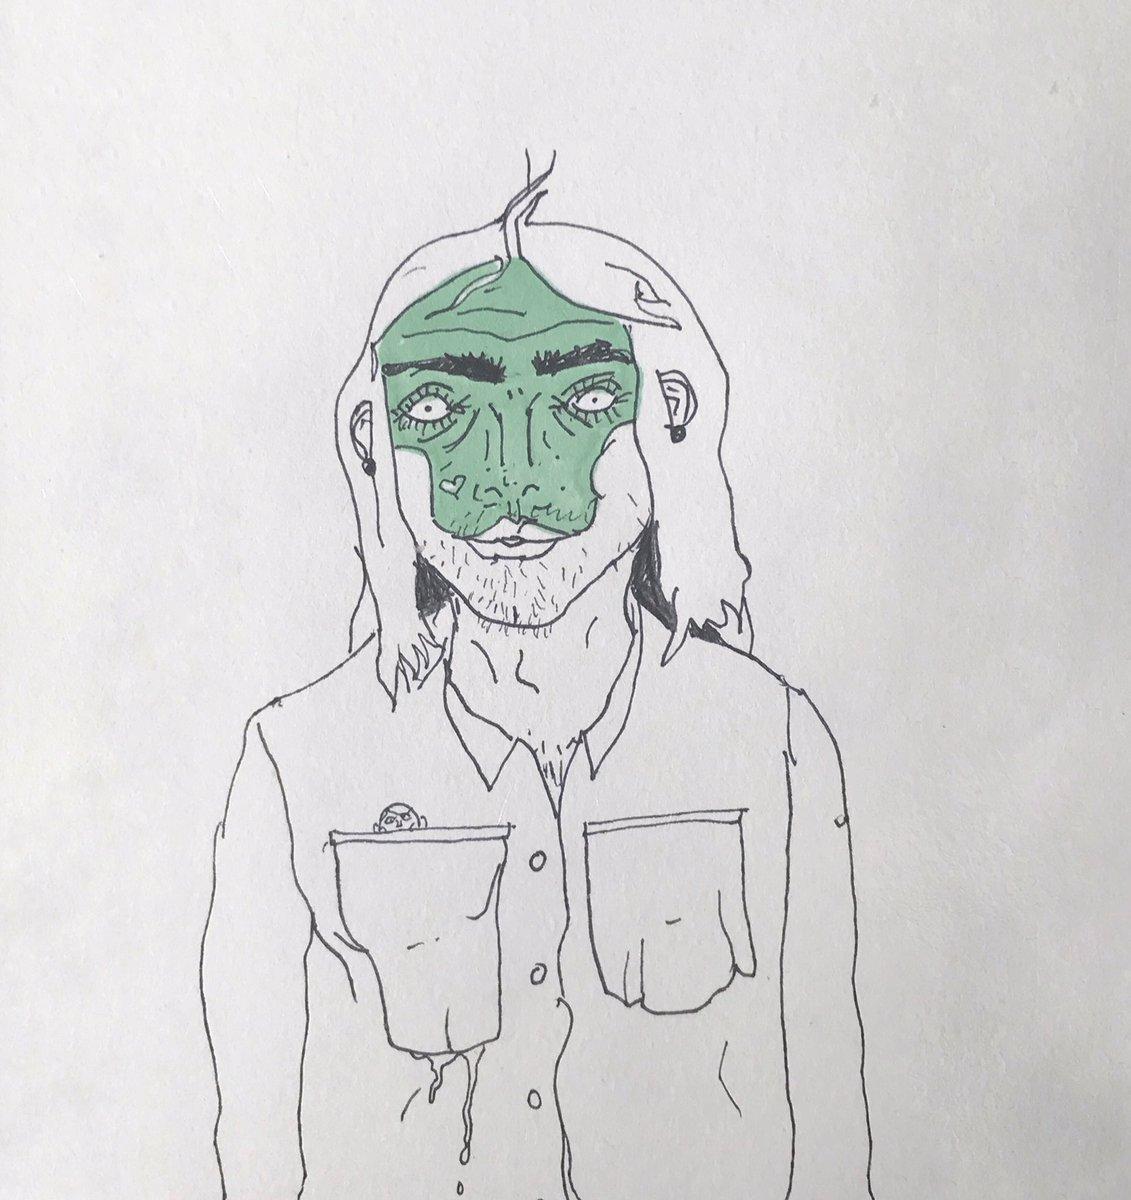 #sketchbook #queerartist #queerart #dailysketch pic.twitter.com/3bgUnsydO2